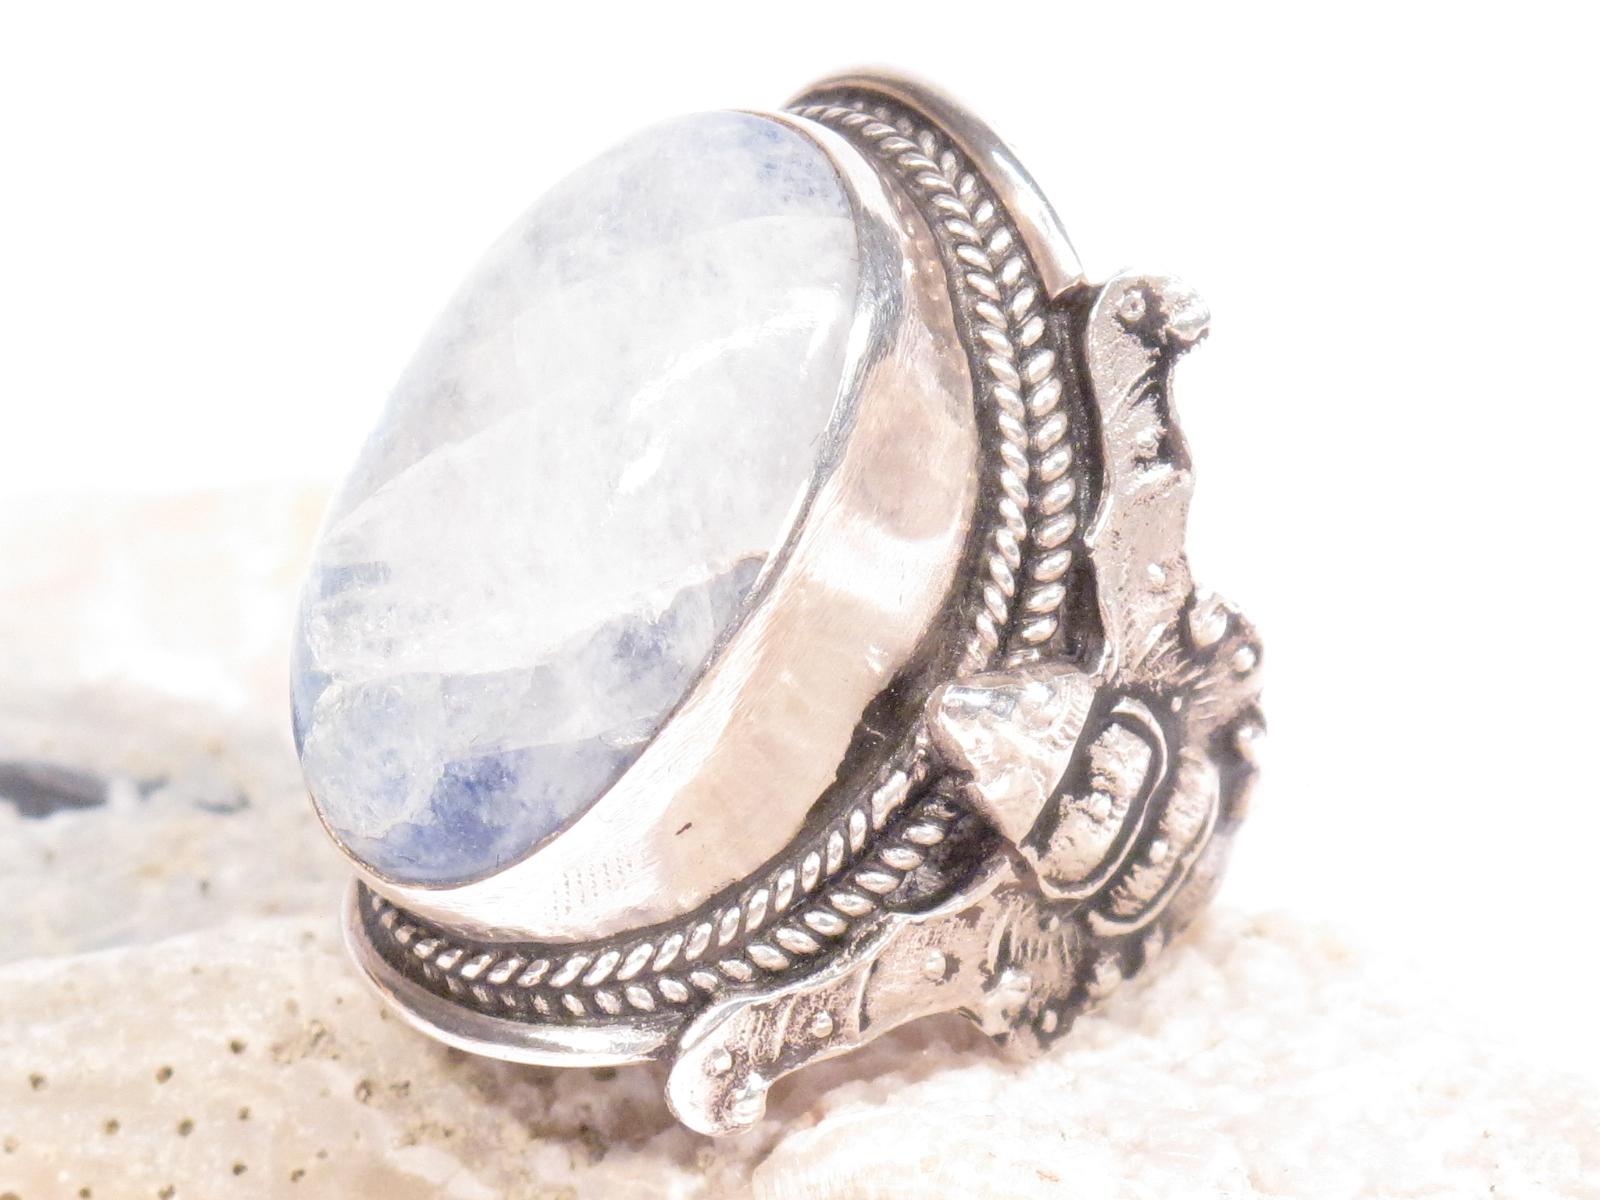 100% de satisfaction paquet à la mode et attrayant 2019 professionnel Anello in argento e pietra di luna